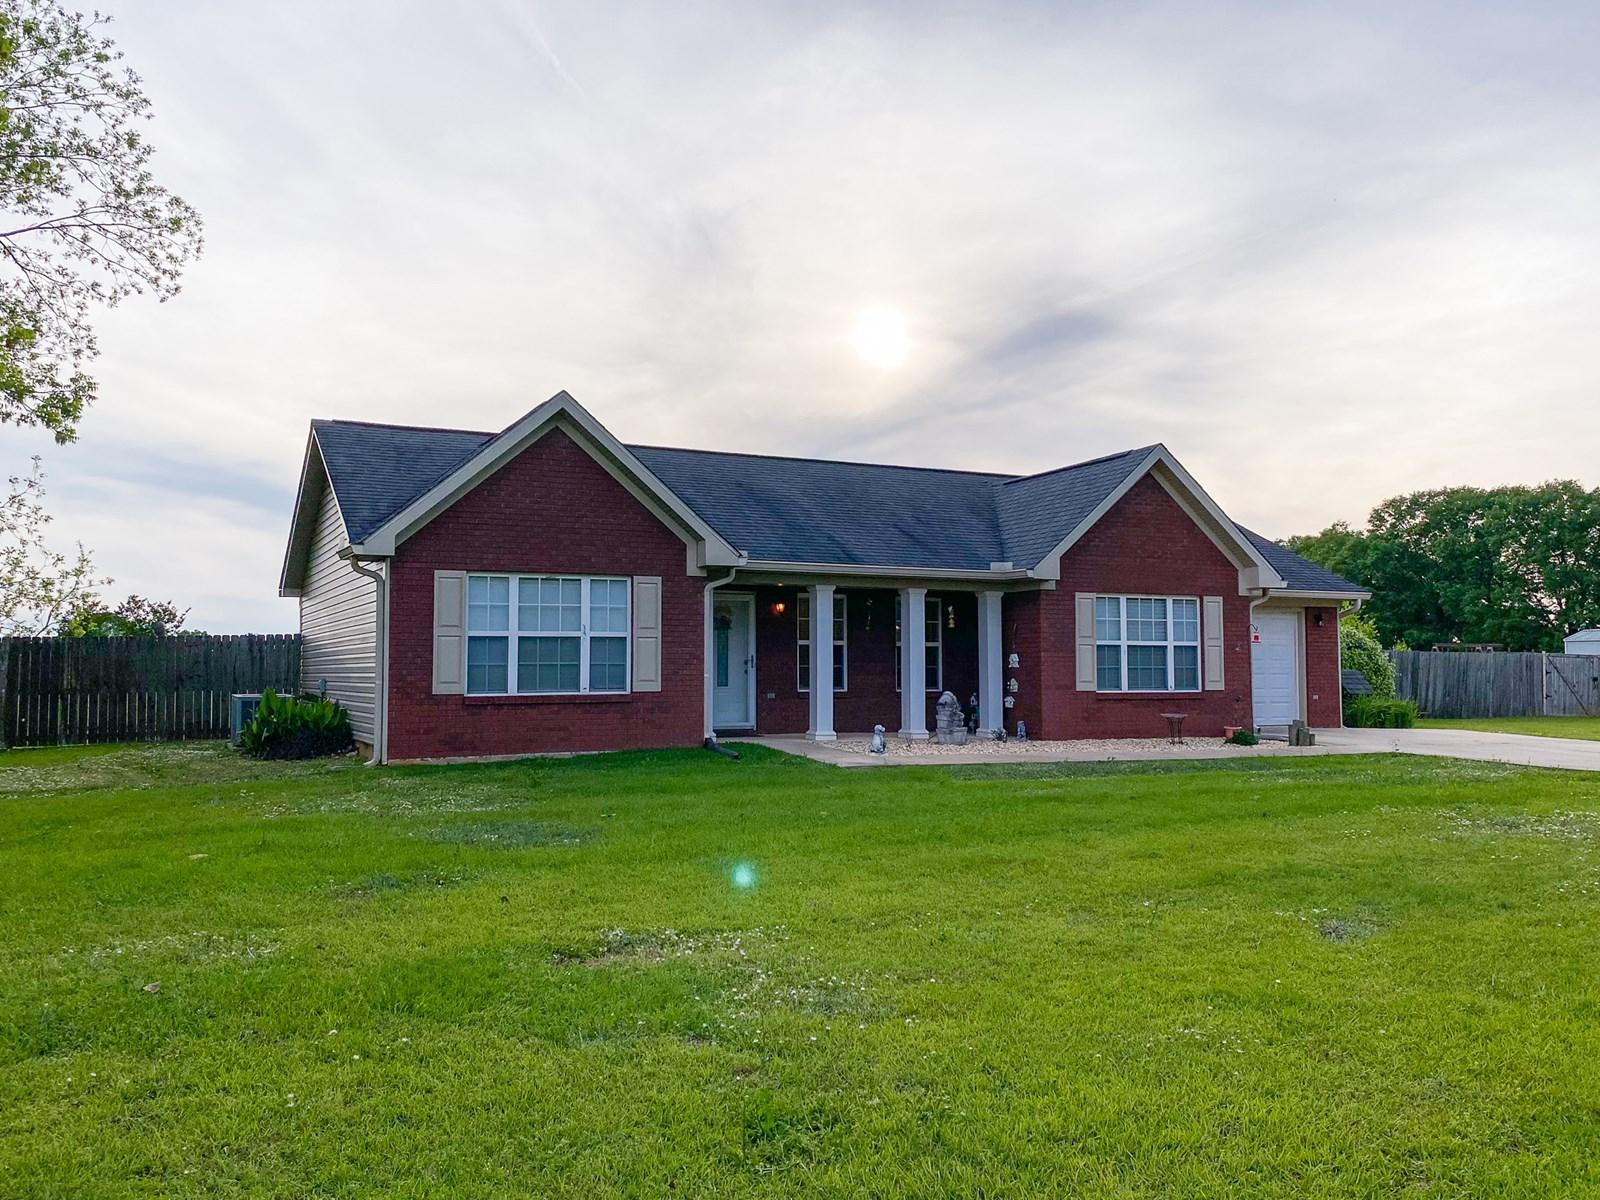 House for Sale w/Large Private Backyard in Enterprise, AL